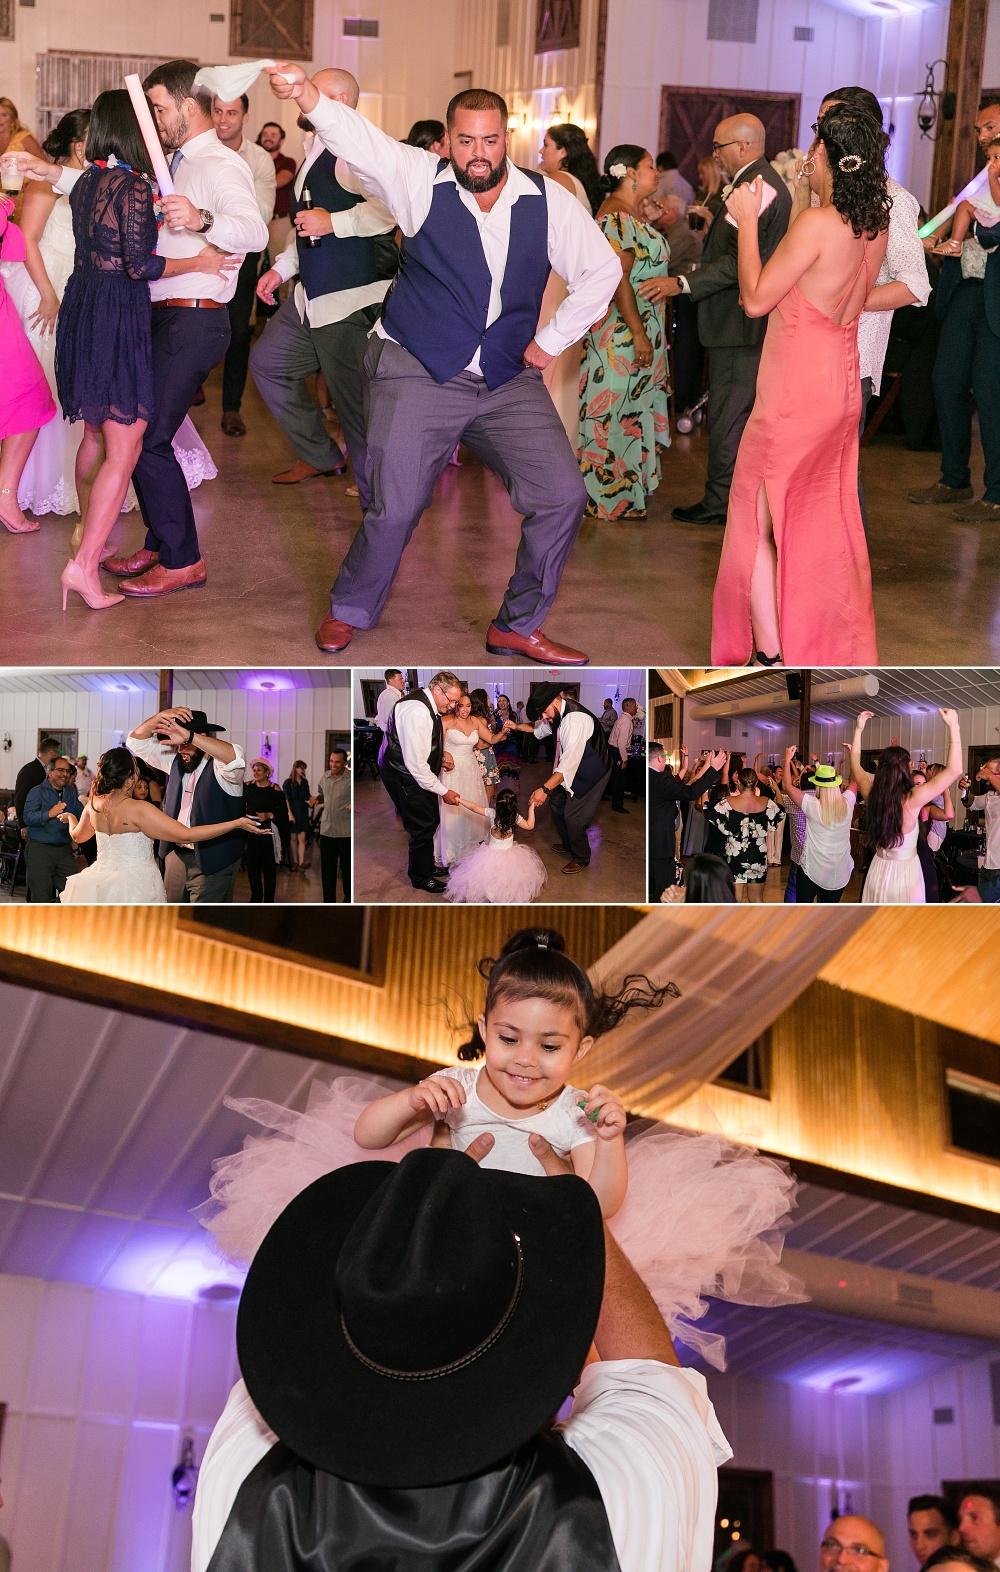 Wedding-Photographer-Bulverde-Texas-Western-Sky-Event-Venue-Carly-Barton-Photography_0065.jpg